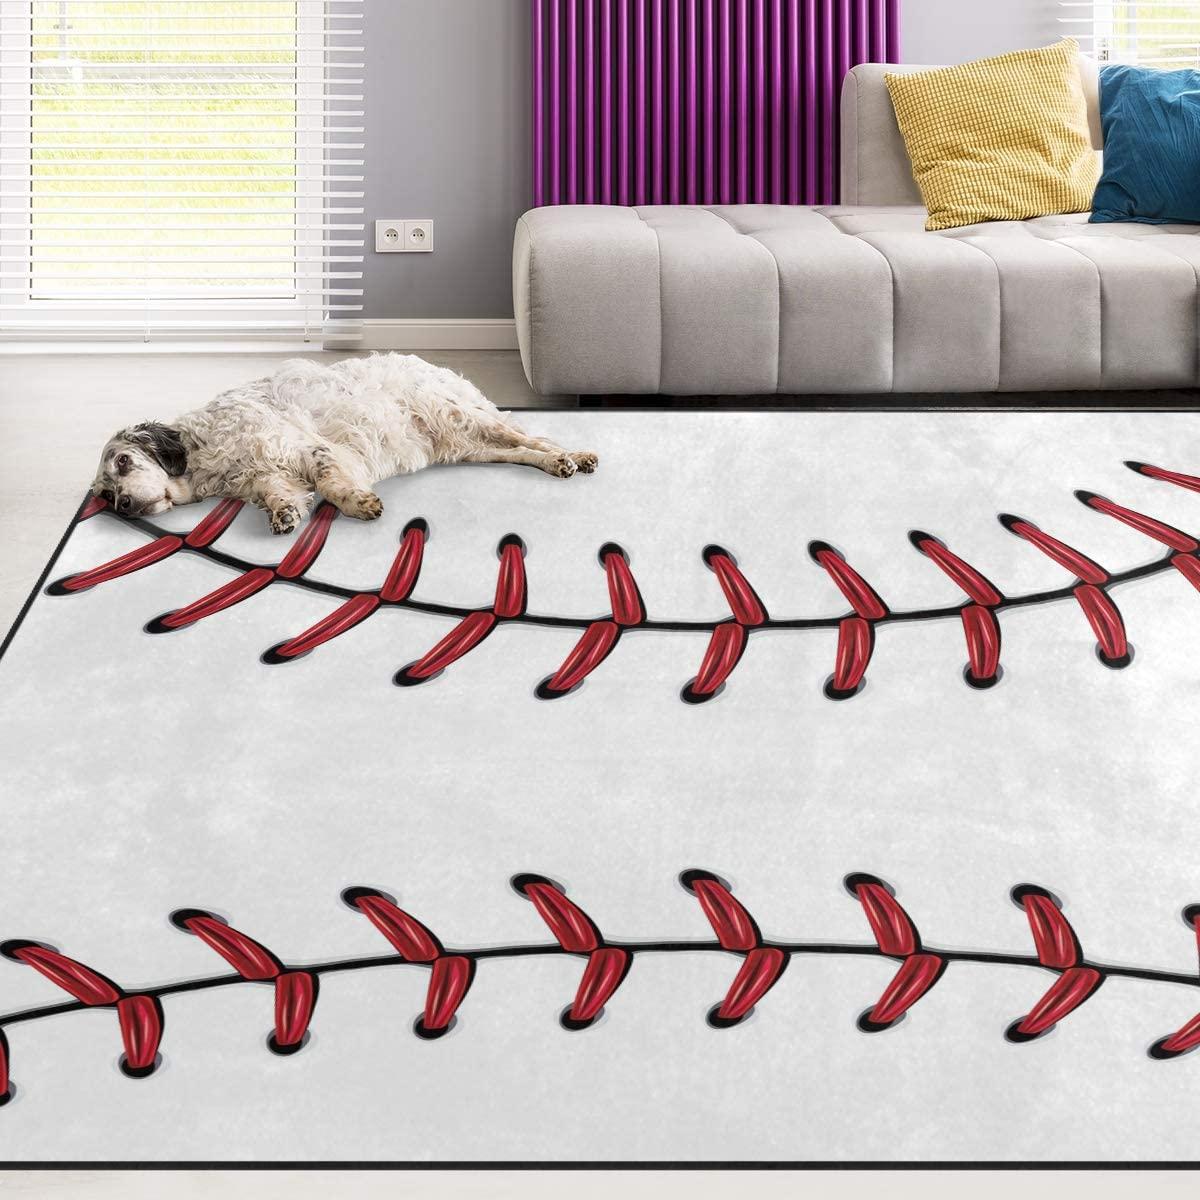 Naanle Sport Baseball Lace Non Slip Area Rug for Living Dinning Room Bedroom Kitchen, 5' x 7'(58 x 80 Inches), Sport Nursery Rug Floor Carpet Yoga Mat